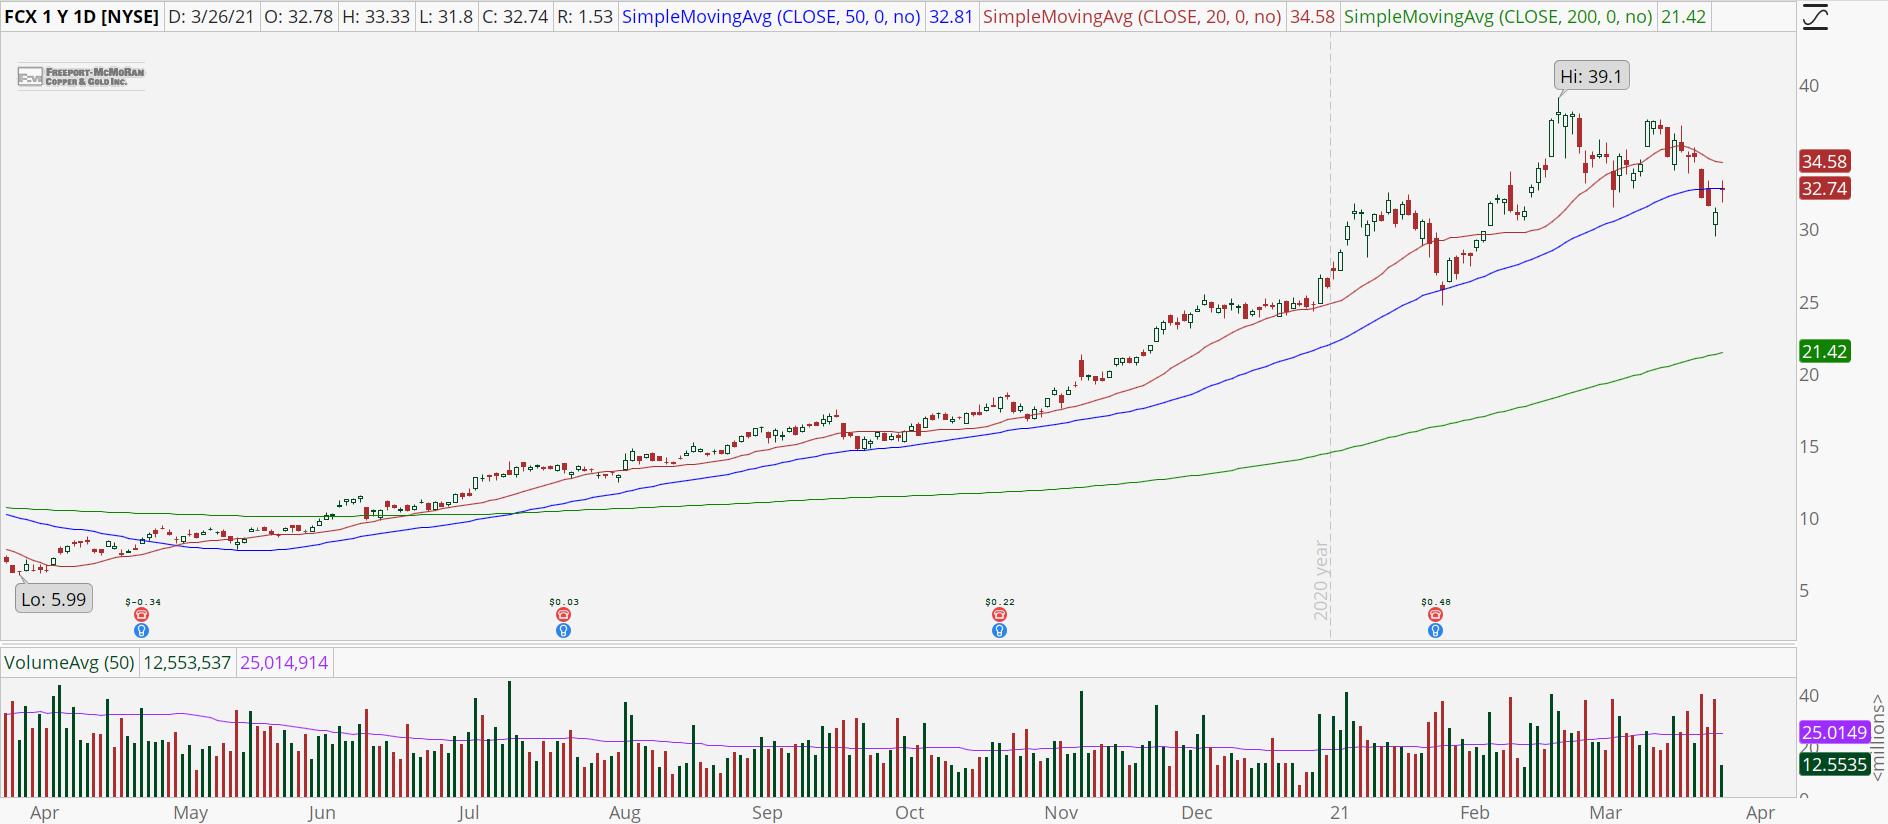 Freeport-McMoRan (FCX) stock with bullish trend.